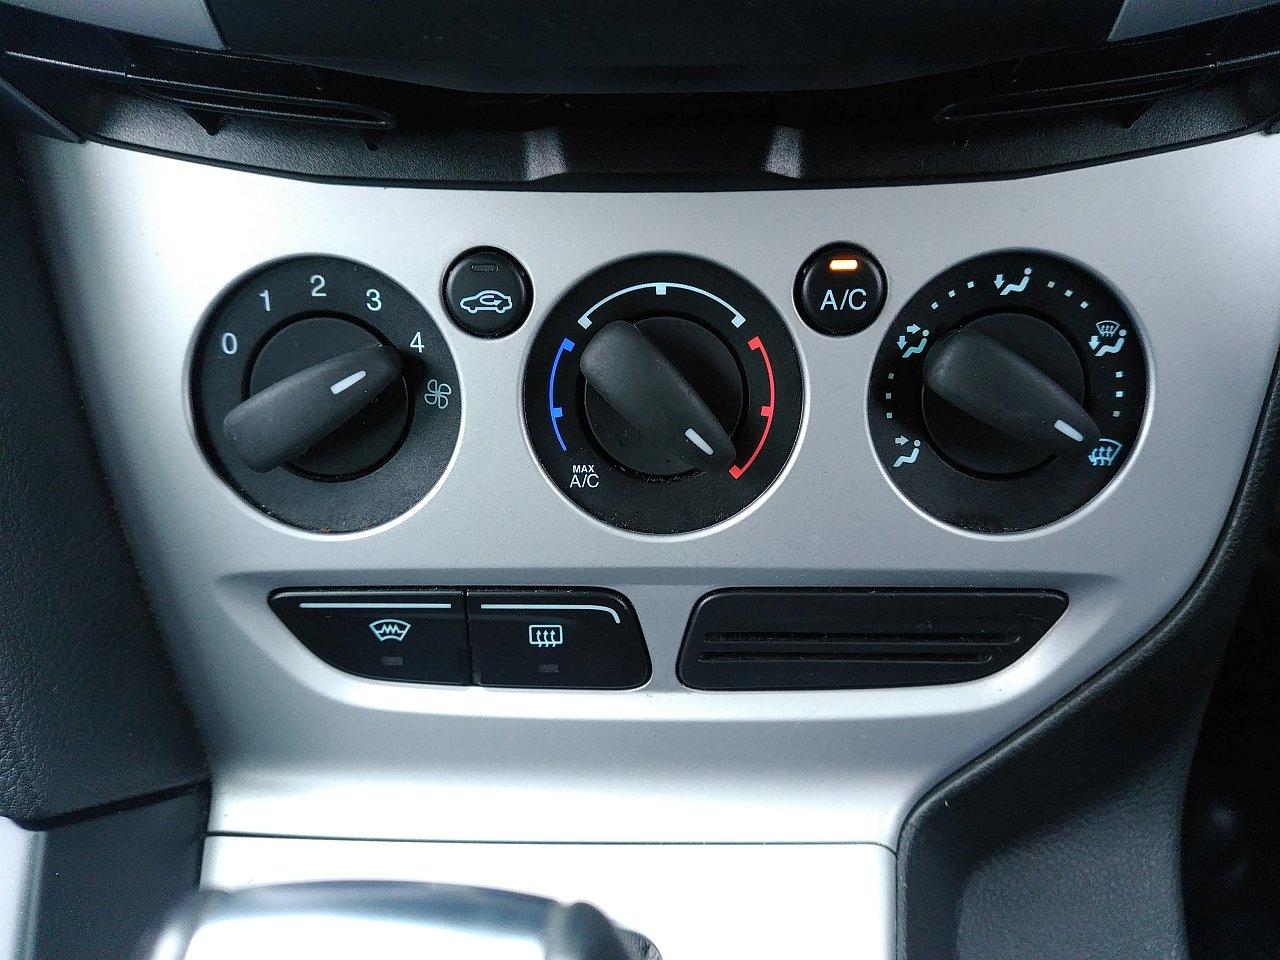 Ford Focus 2.0 TDCi 163 Zetec S 5dr Powershift image 17